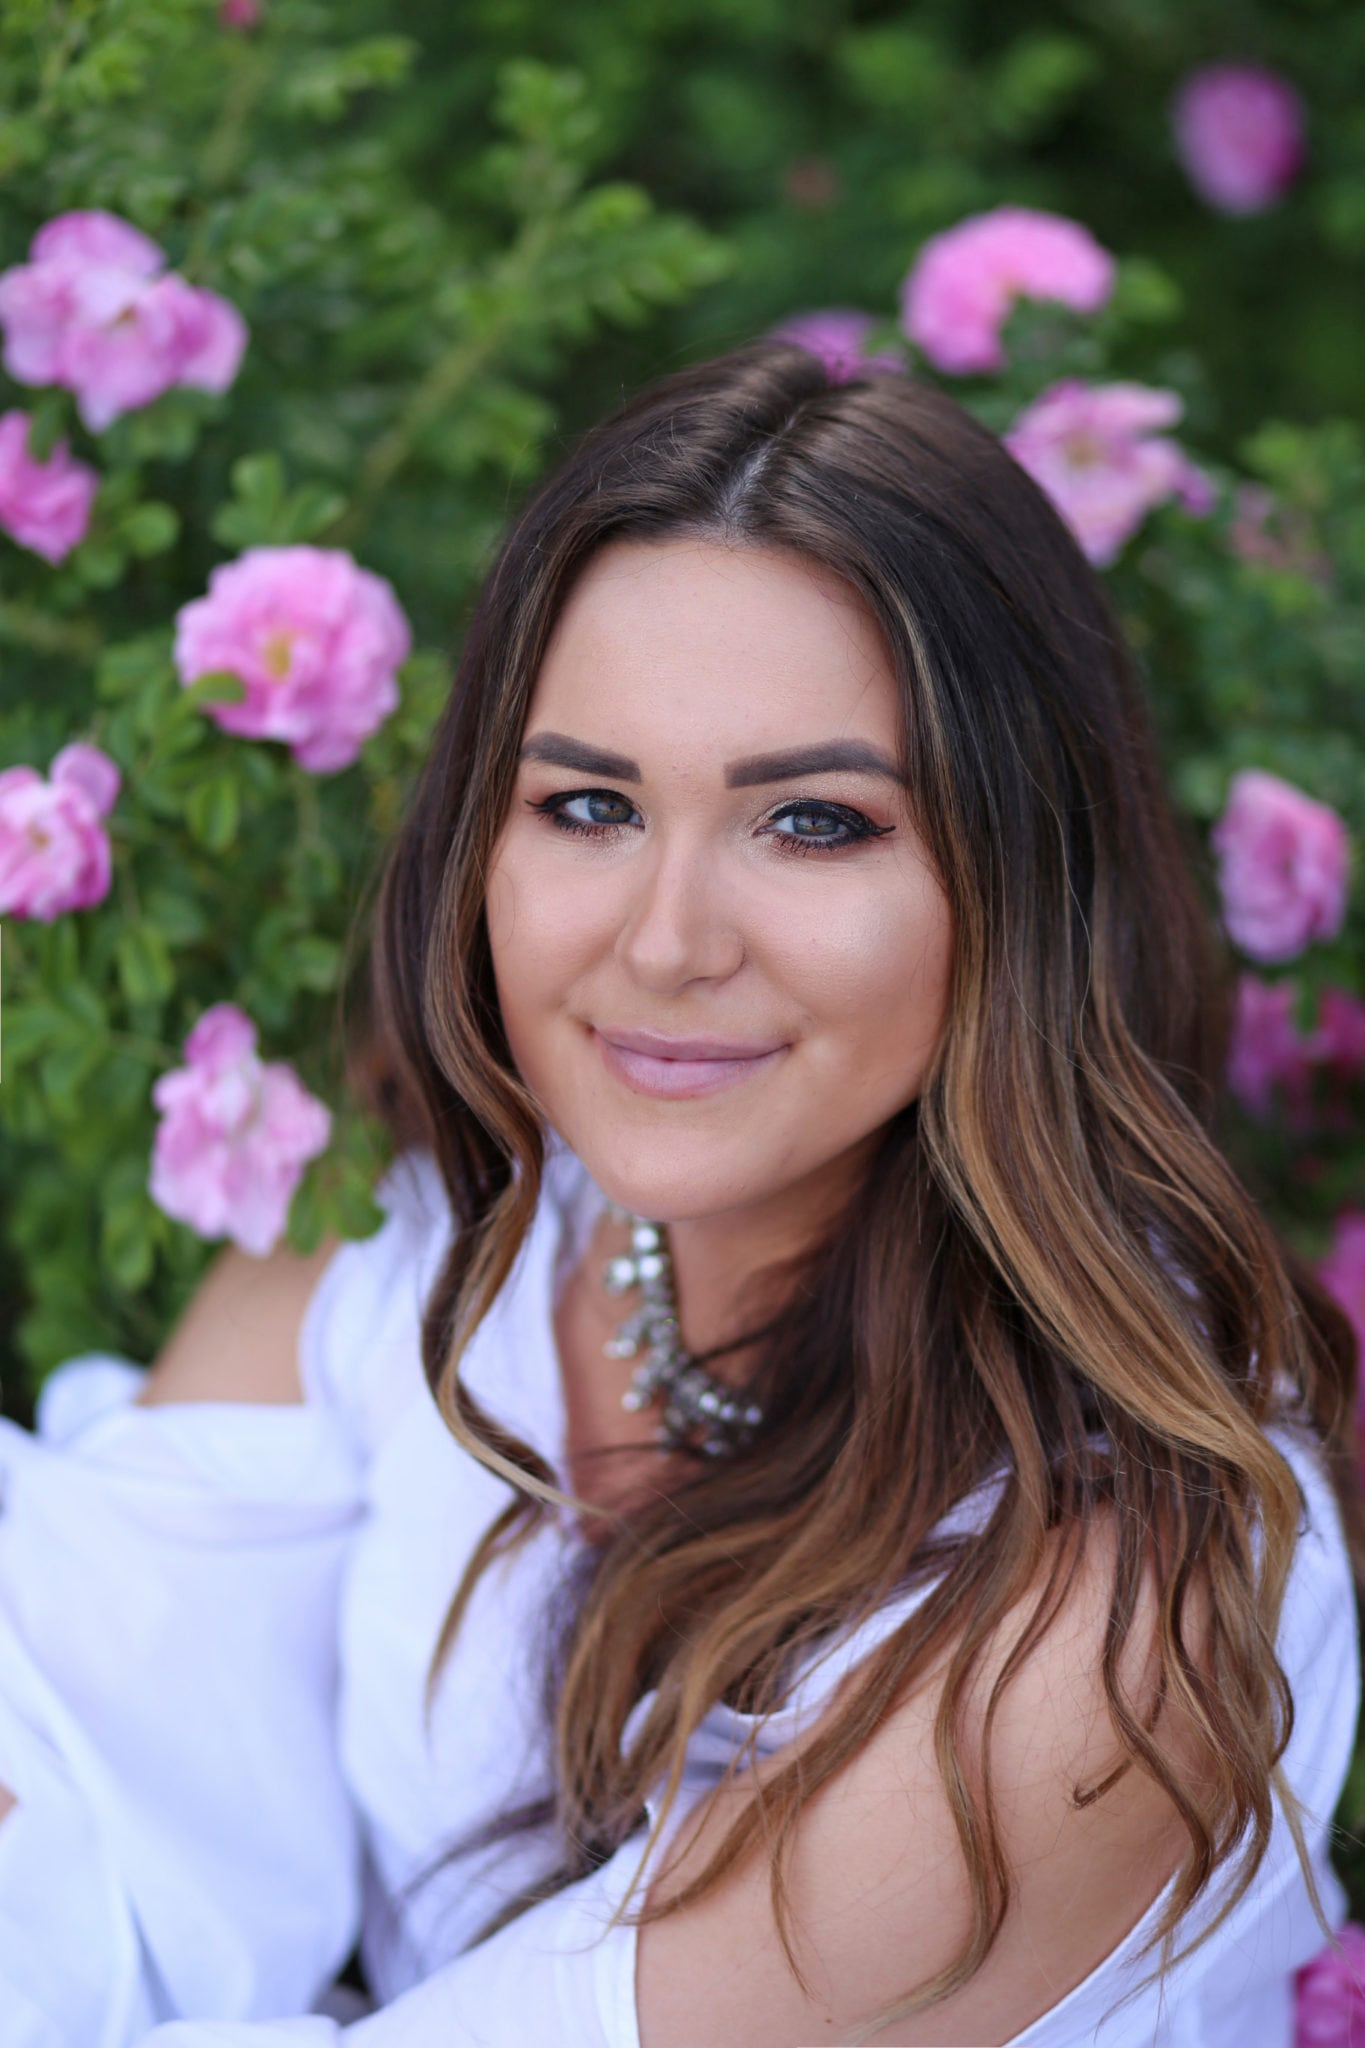 Blogger Mash Elle shares how to prevent wrinkles in your 20s   wrinkle prevention   no wrinkles   beauty blogger